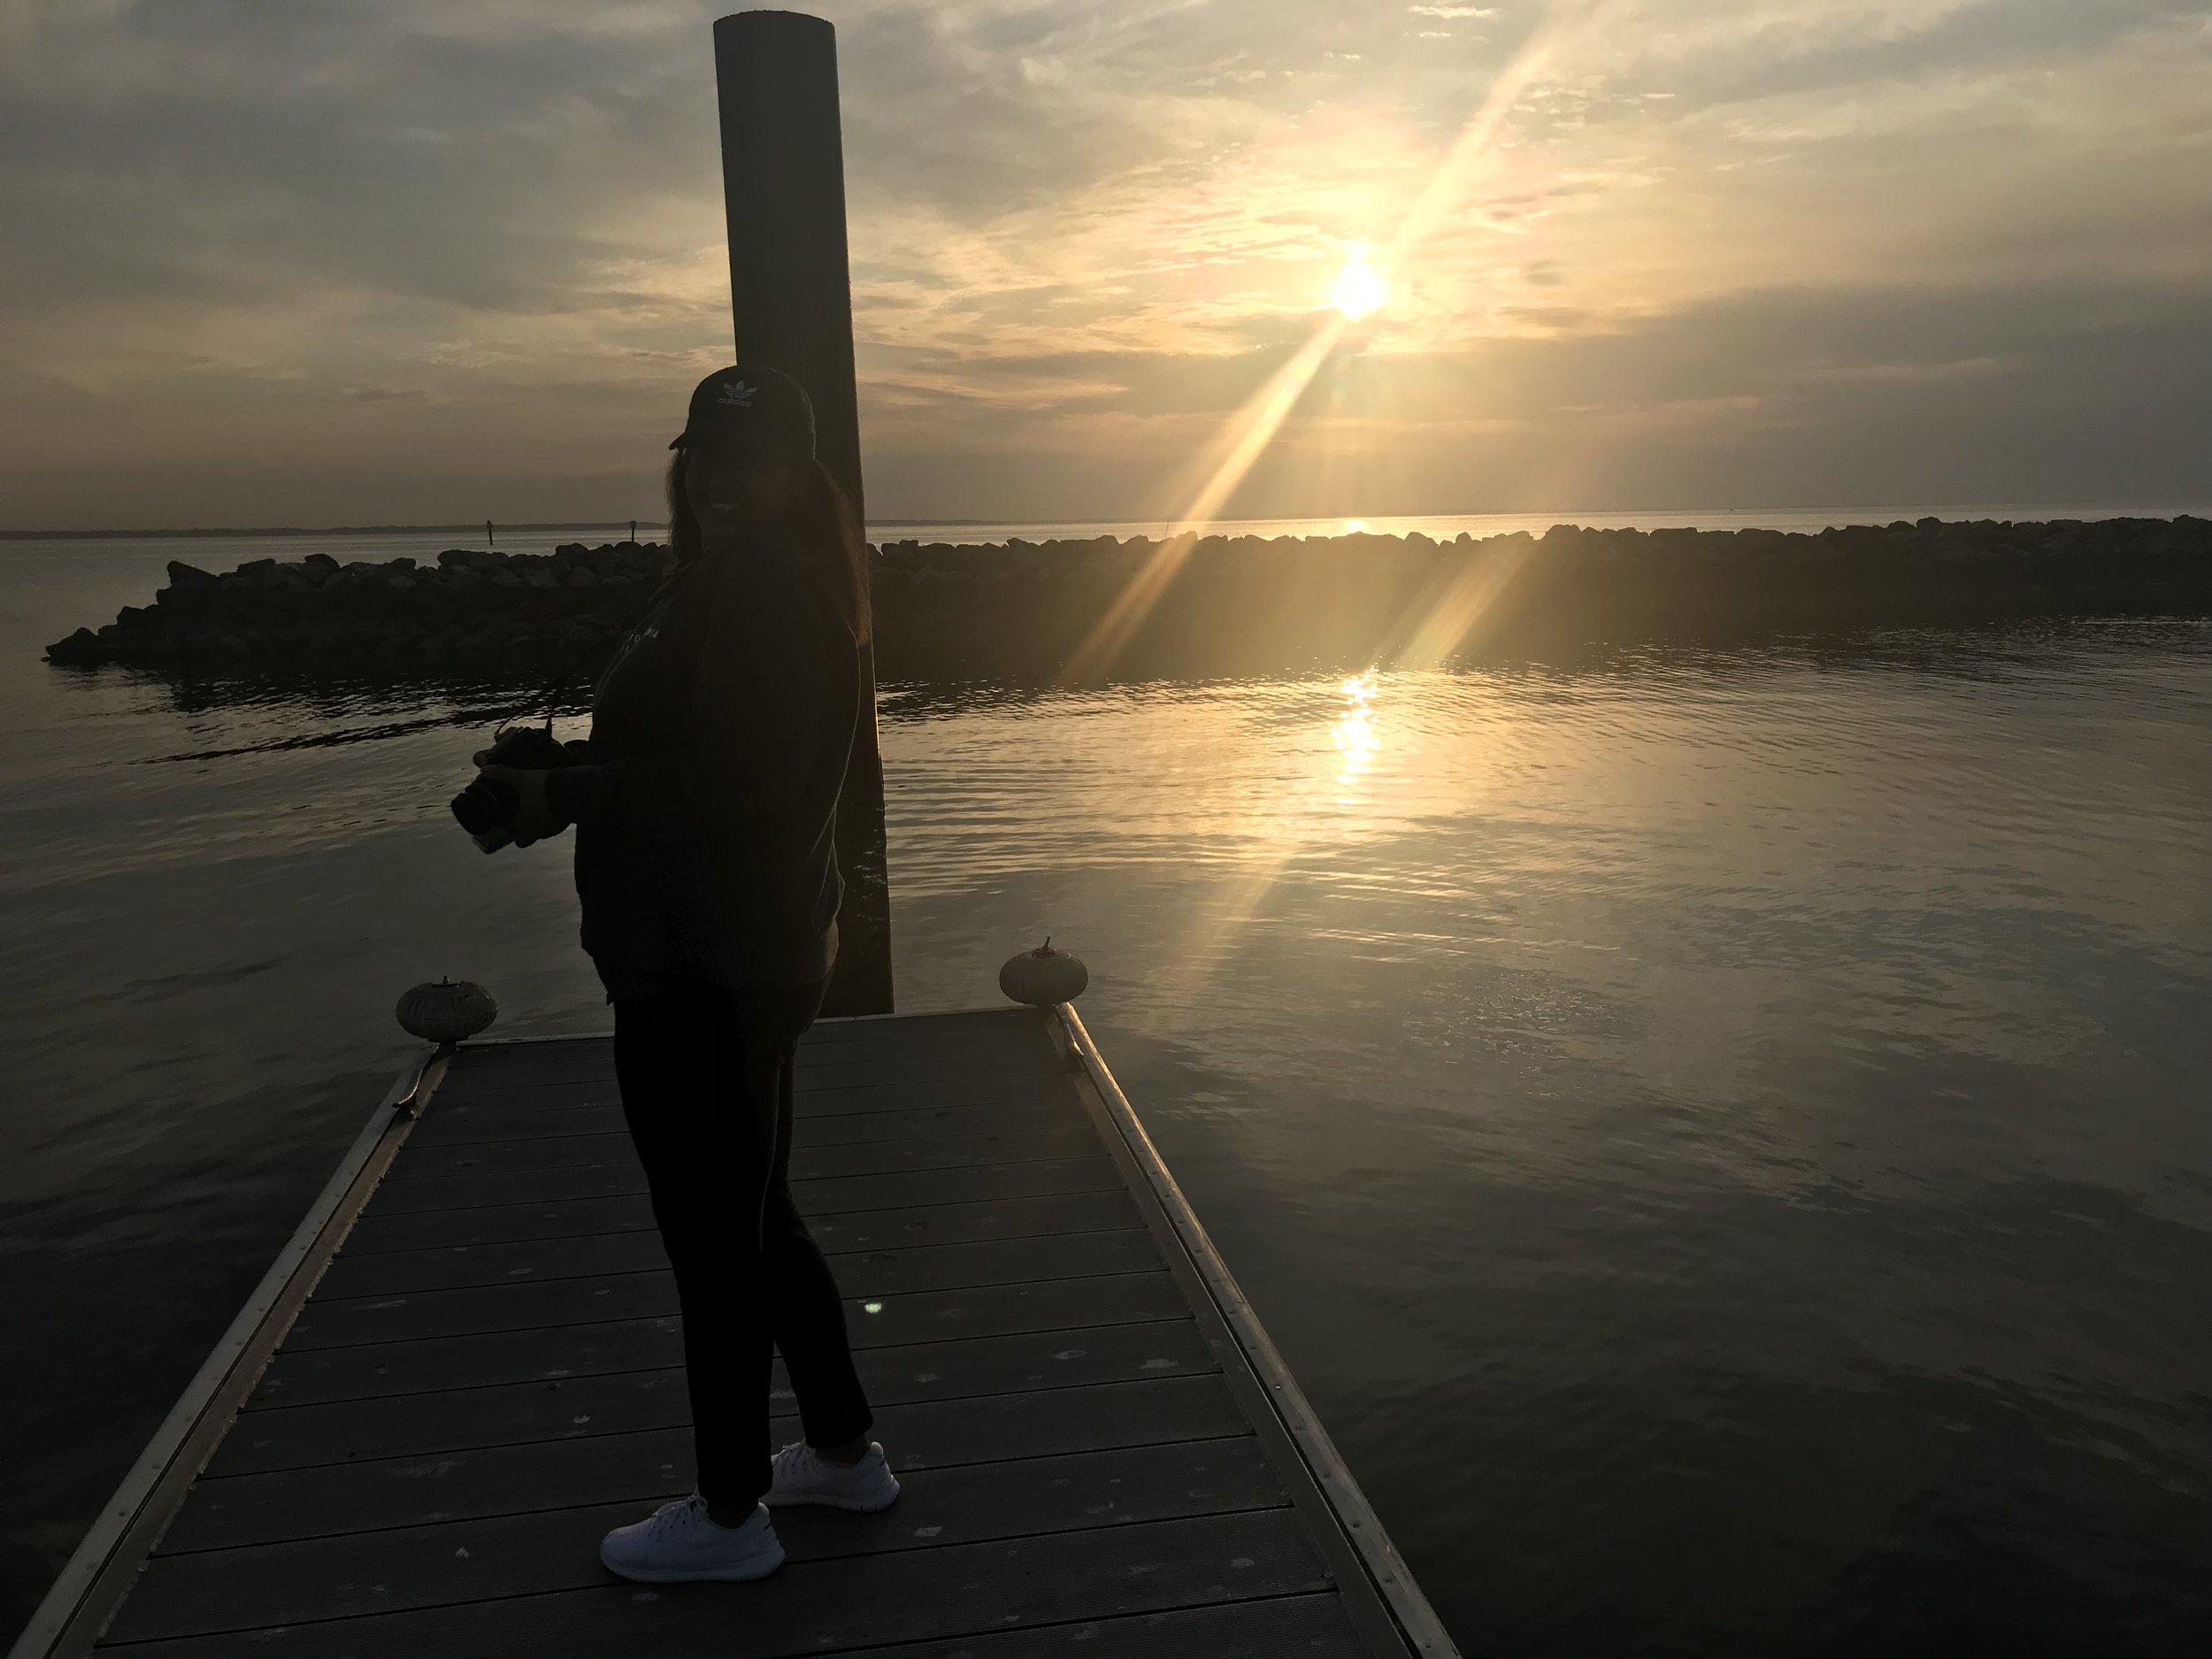 Enjoying the sunset at a dock in Newport News, Virginia.